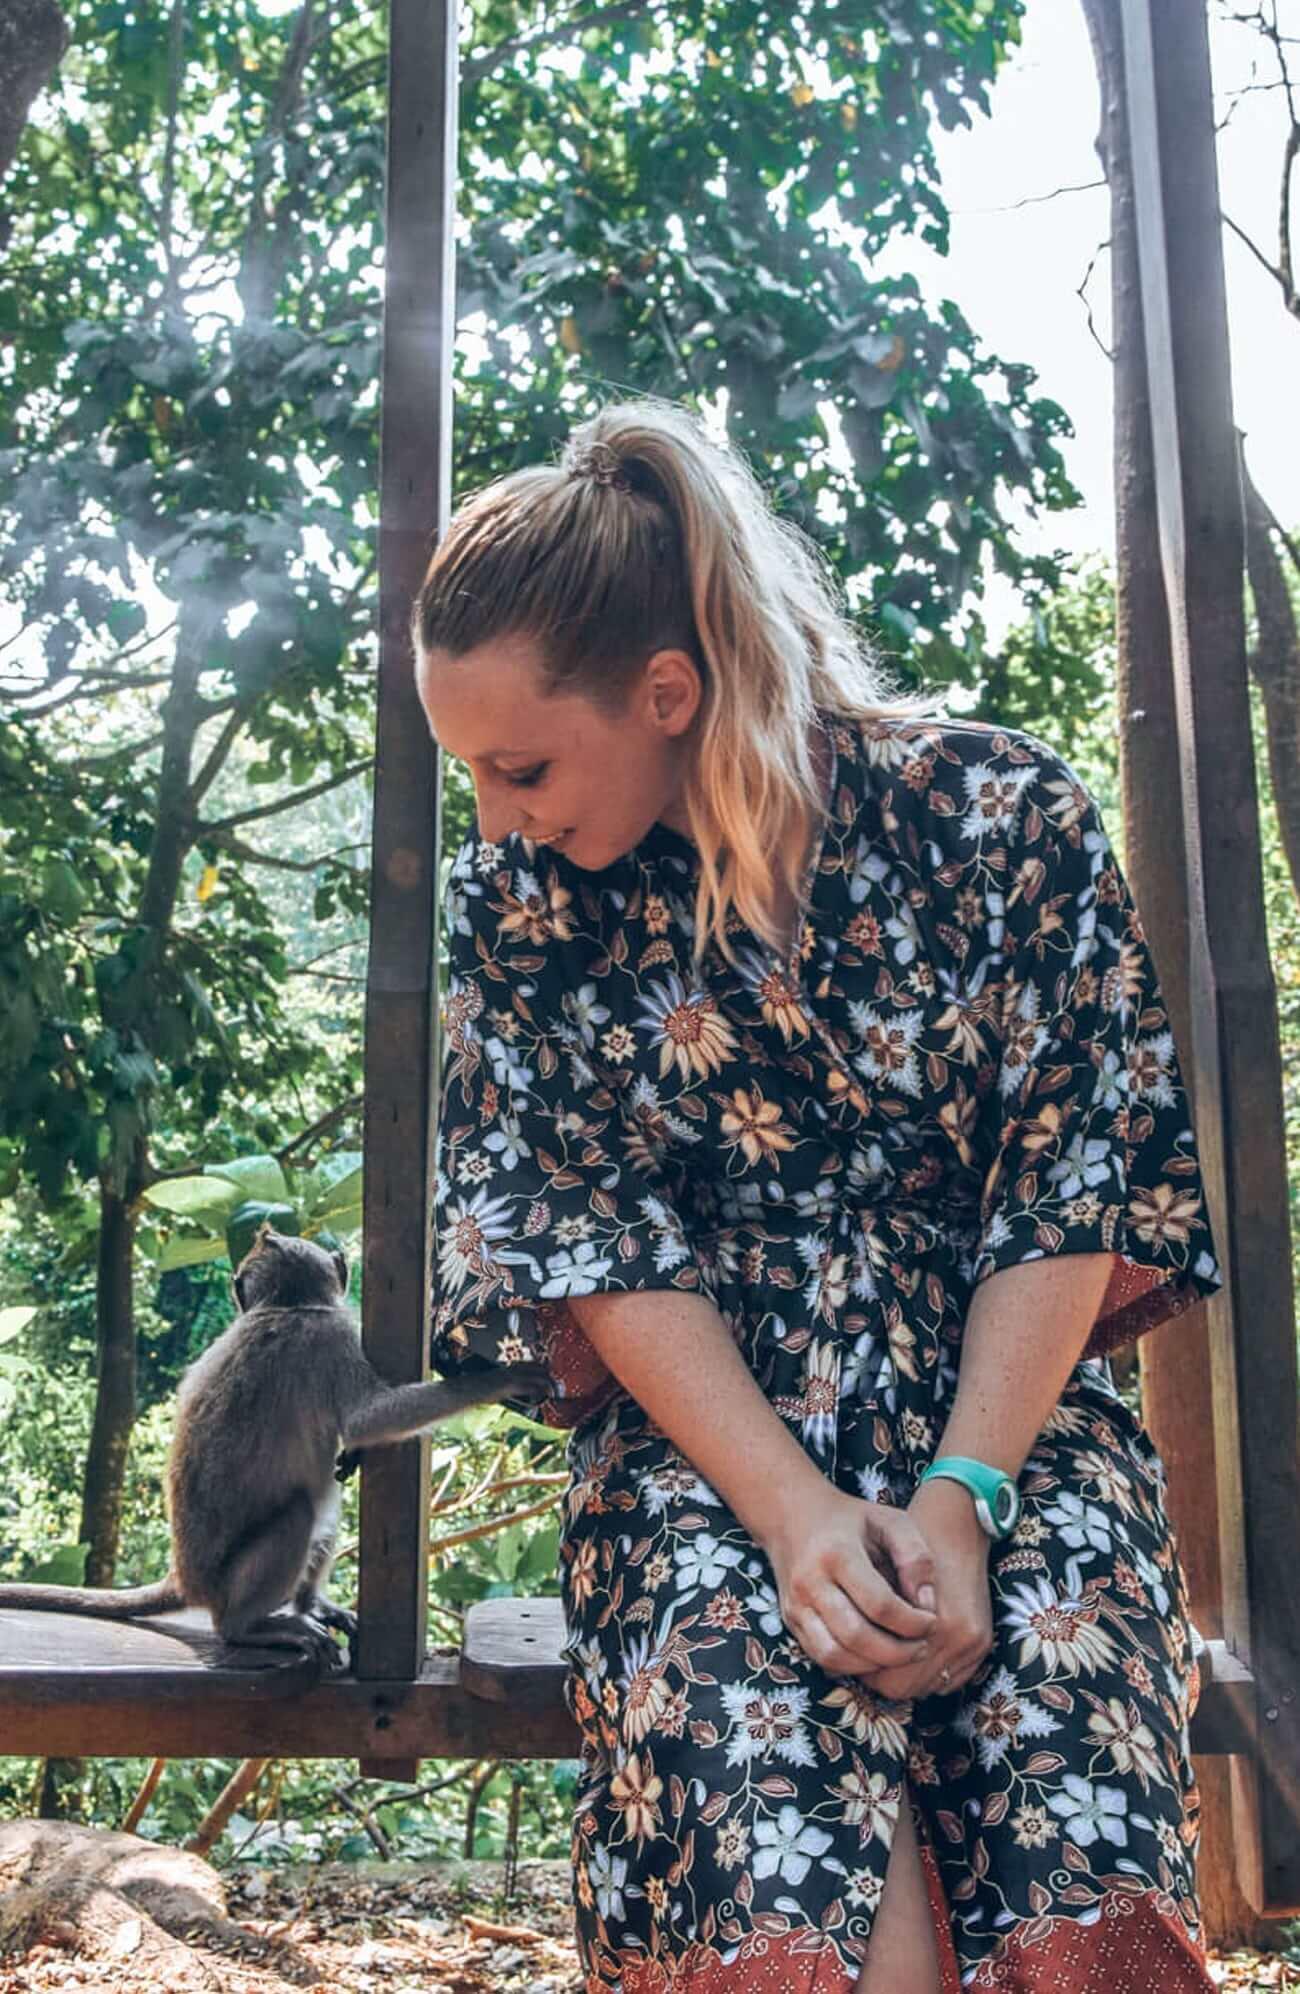 Ubud-Bali-Indonesie-La revue de Kathleen-Blog-Lifestyle-voyage-Paris